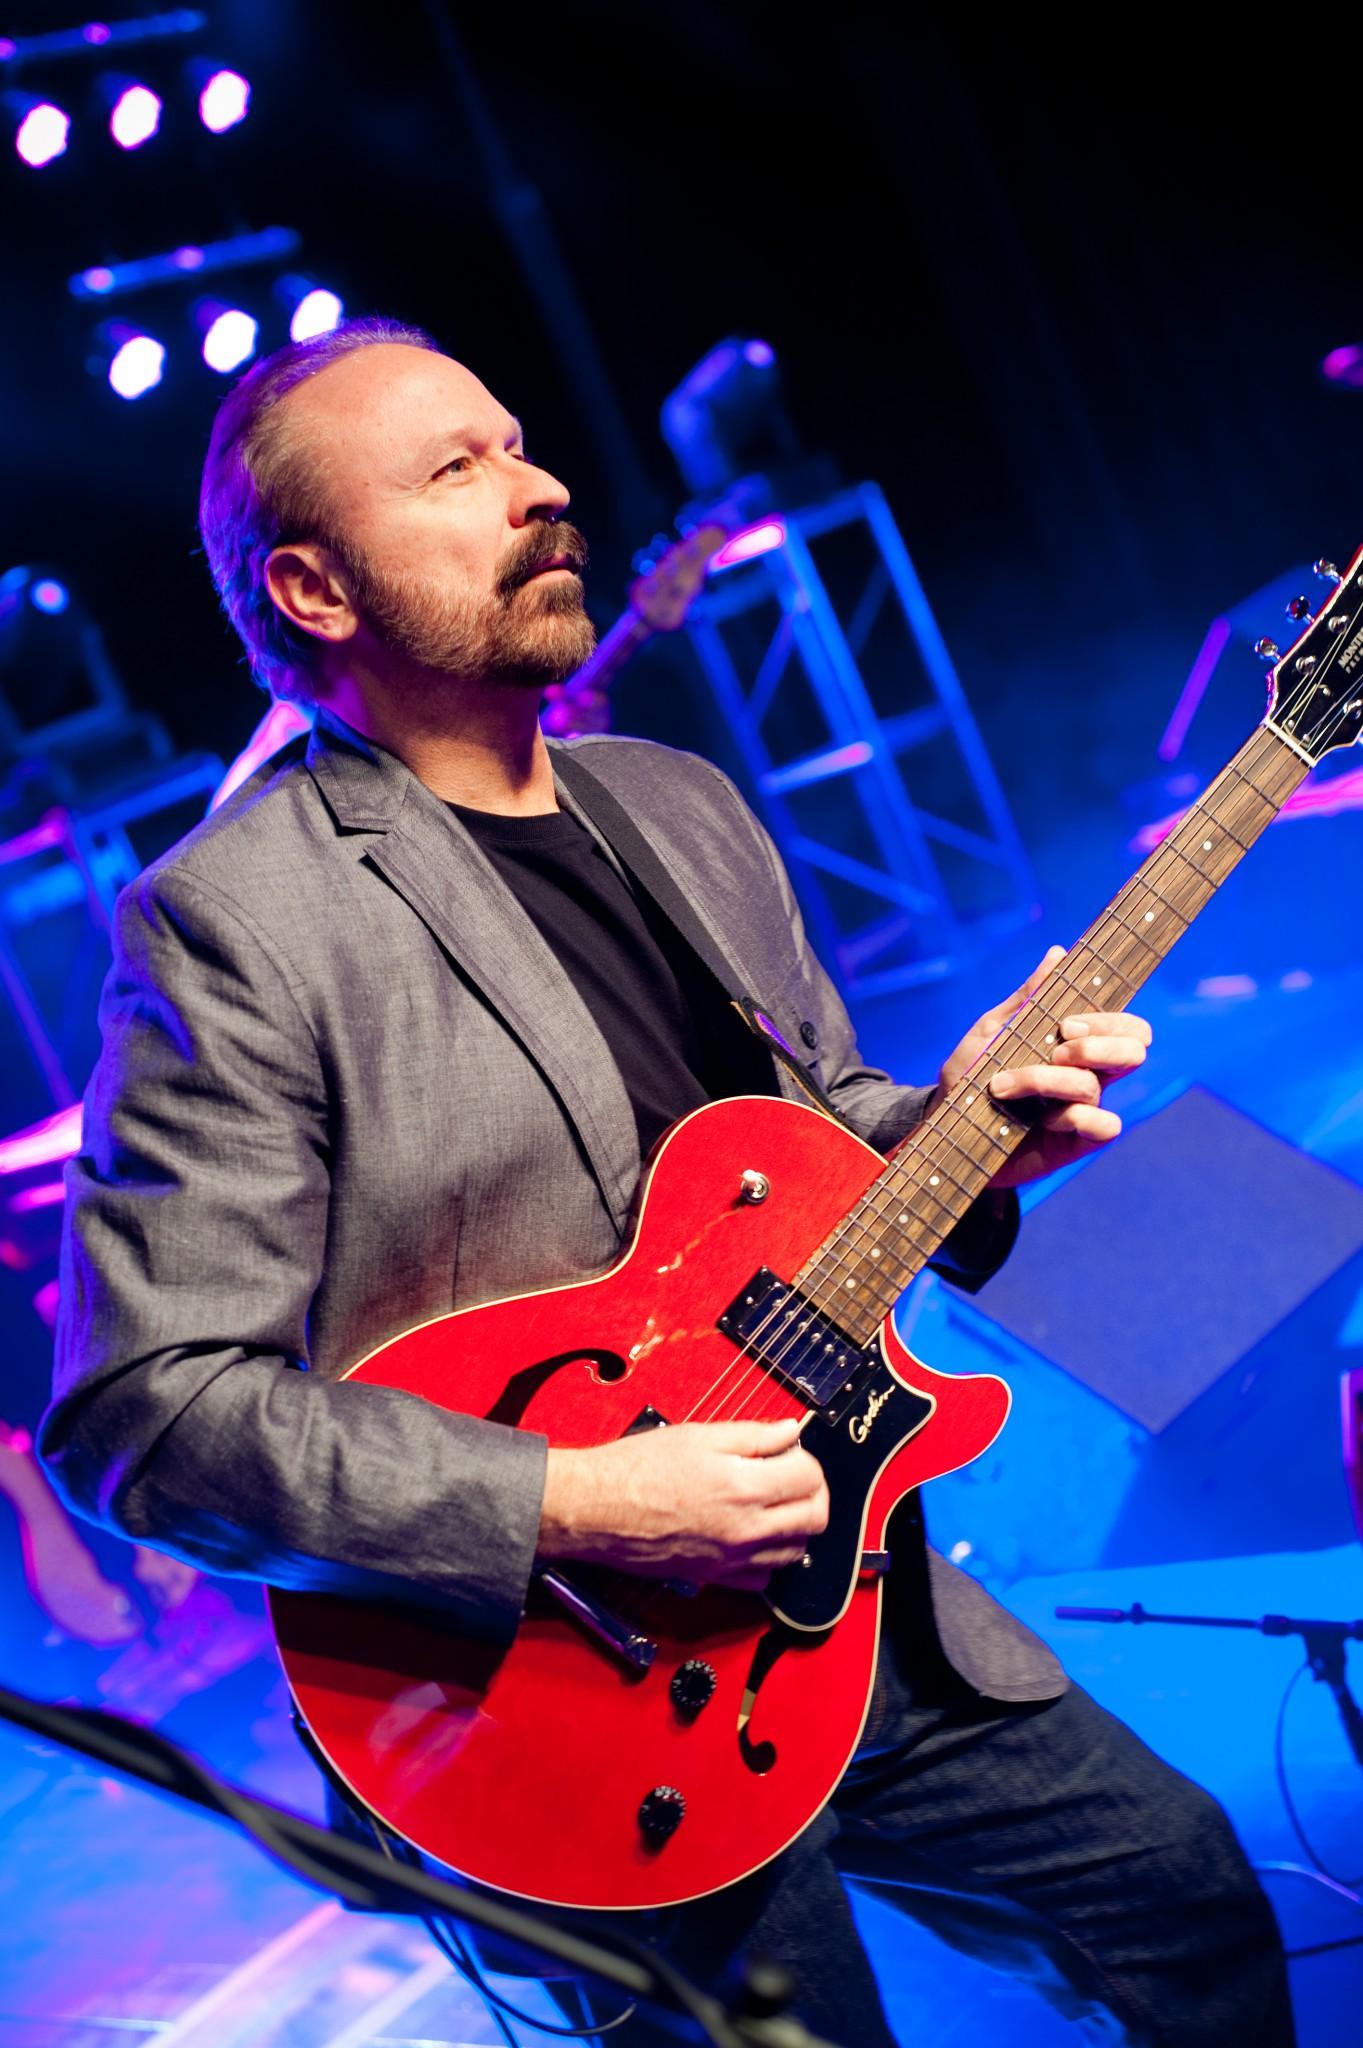 Genesis' Touring-Guitarist, Daryl Stuermer (2007)